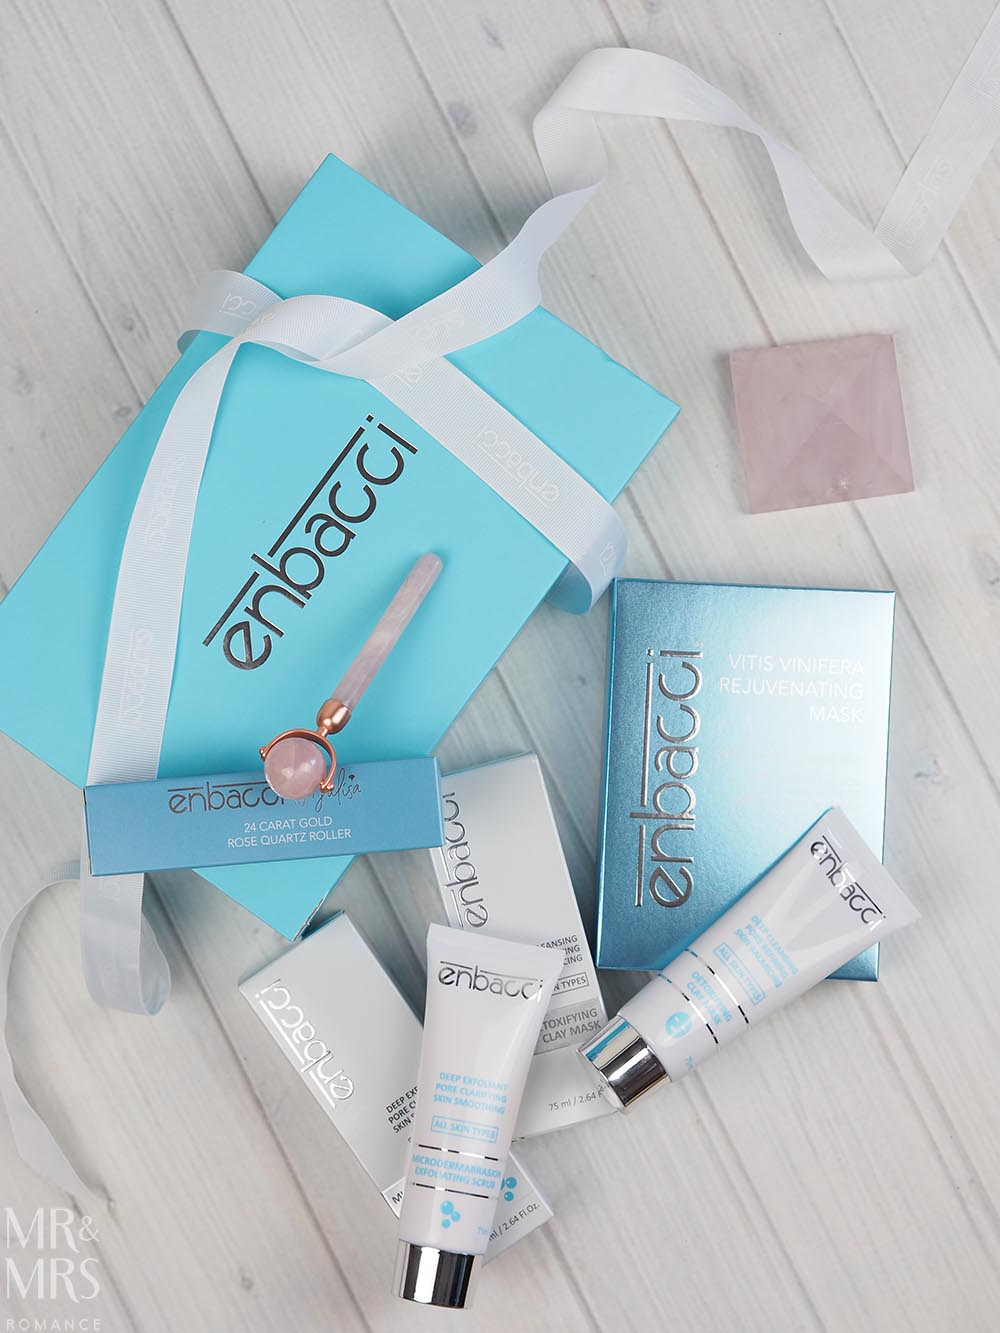 Embacci -Cosmetics gift ideas